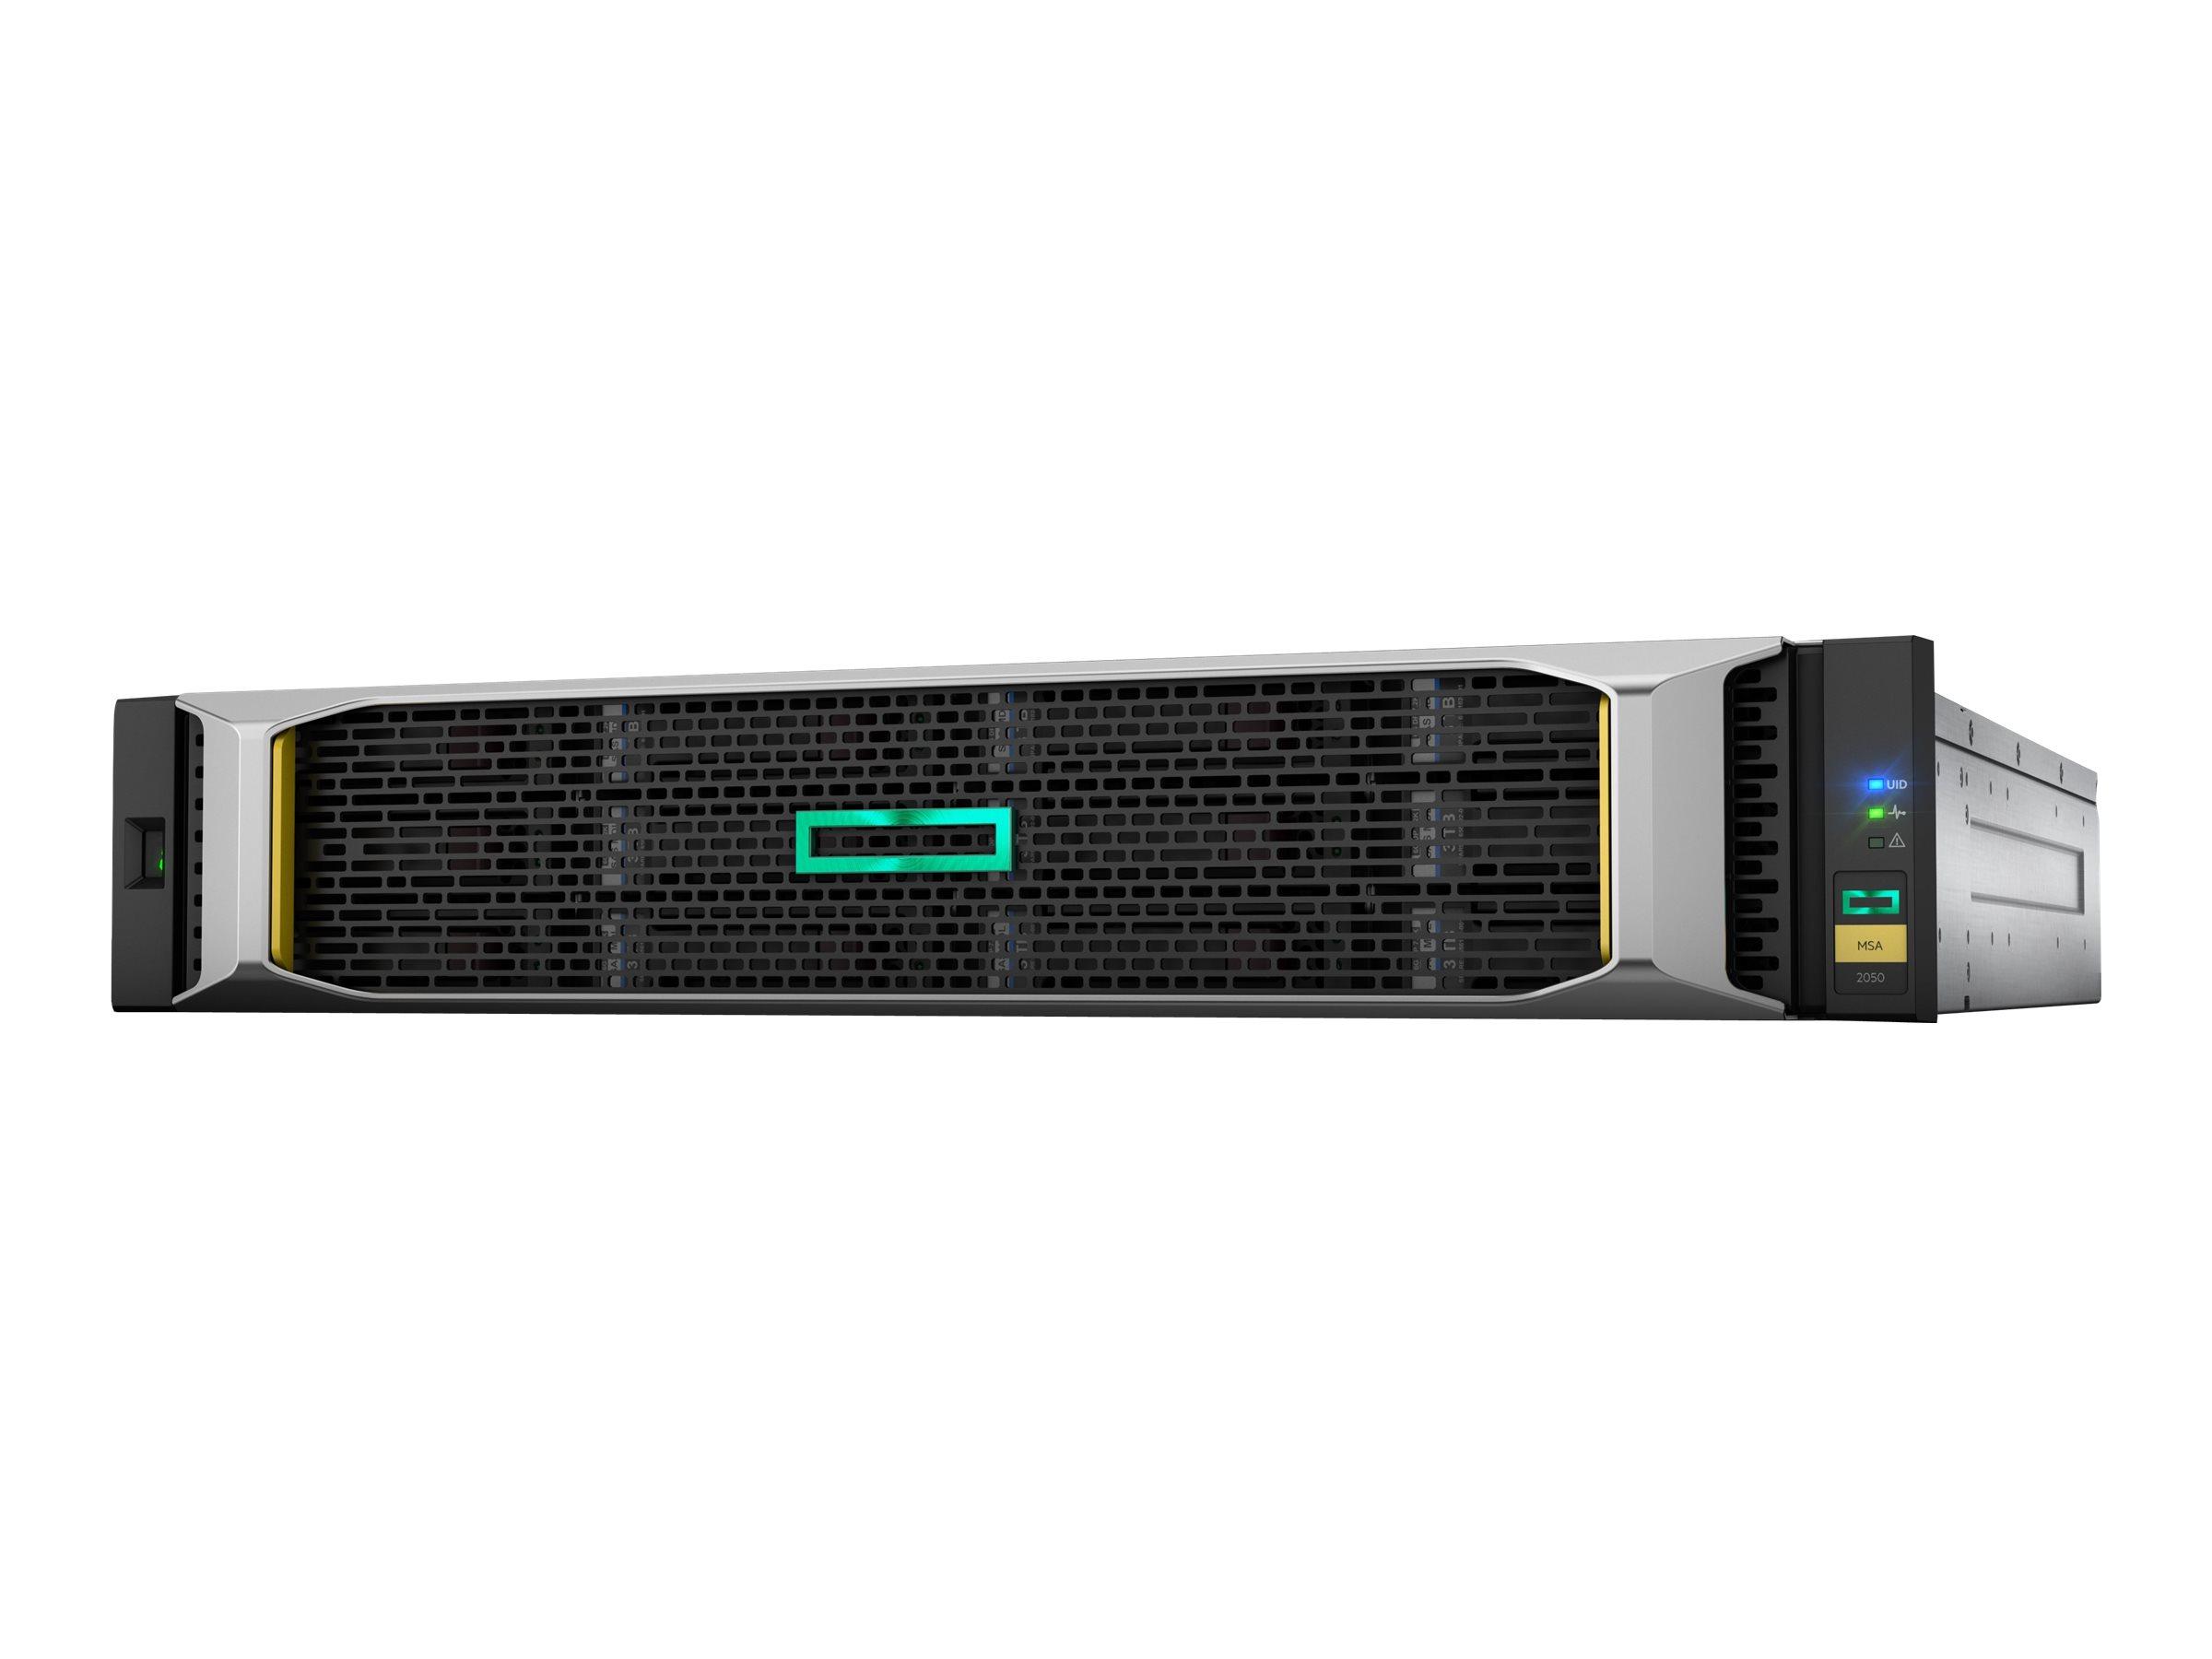 HPE Modular Smart Array 2050 SAS DC Power LFF Storage - Festplatten-Array - 12 Schächte (SAS-3) - SAS 12Gb/s (extern) - Rack - e